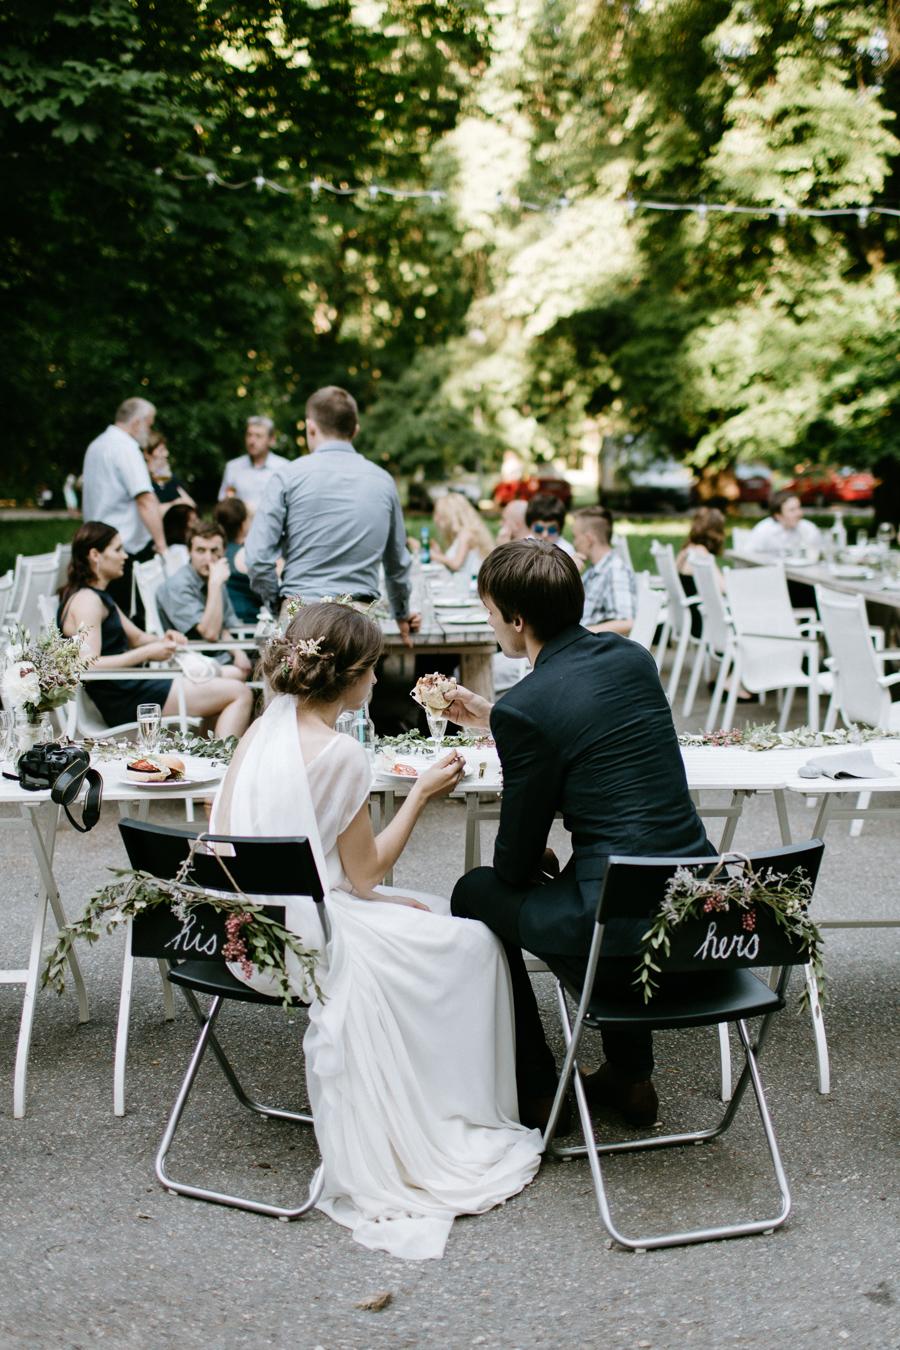 112-everbay-wedding-kaja&ondra-IMG_6073.jpg